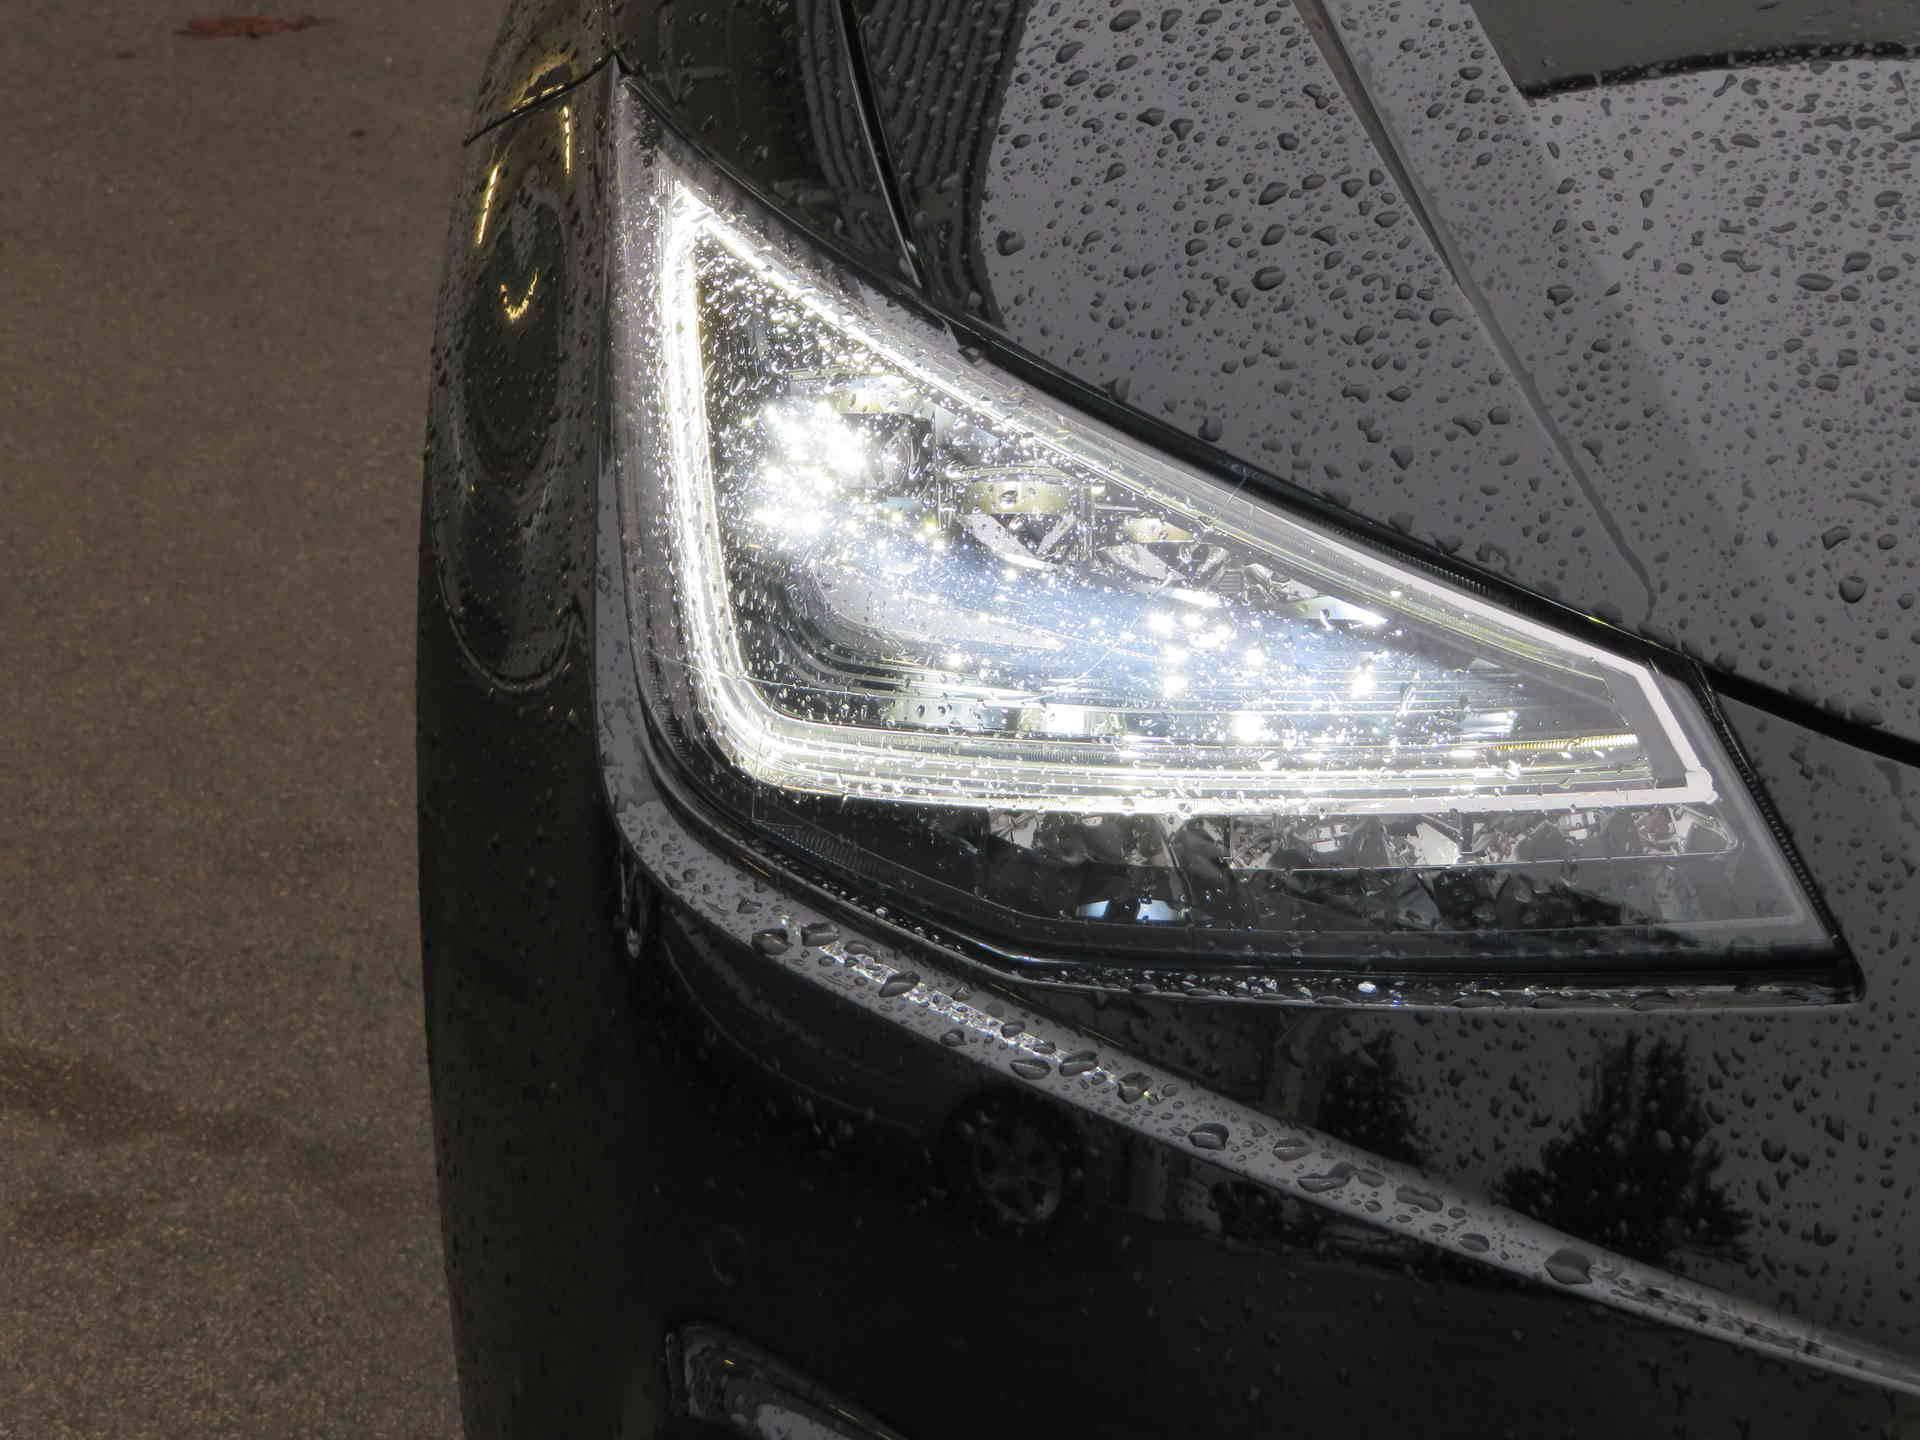 8 - Ibiza 1.0 EcoTSI 115 ch S/S BVM6